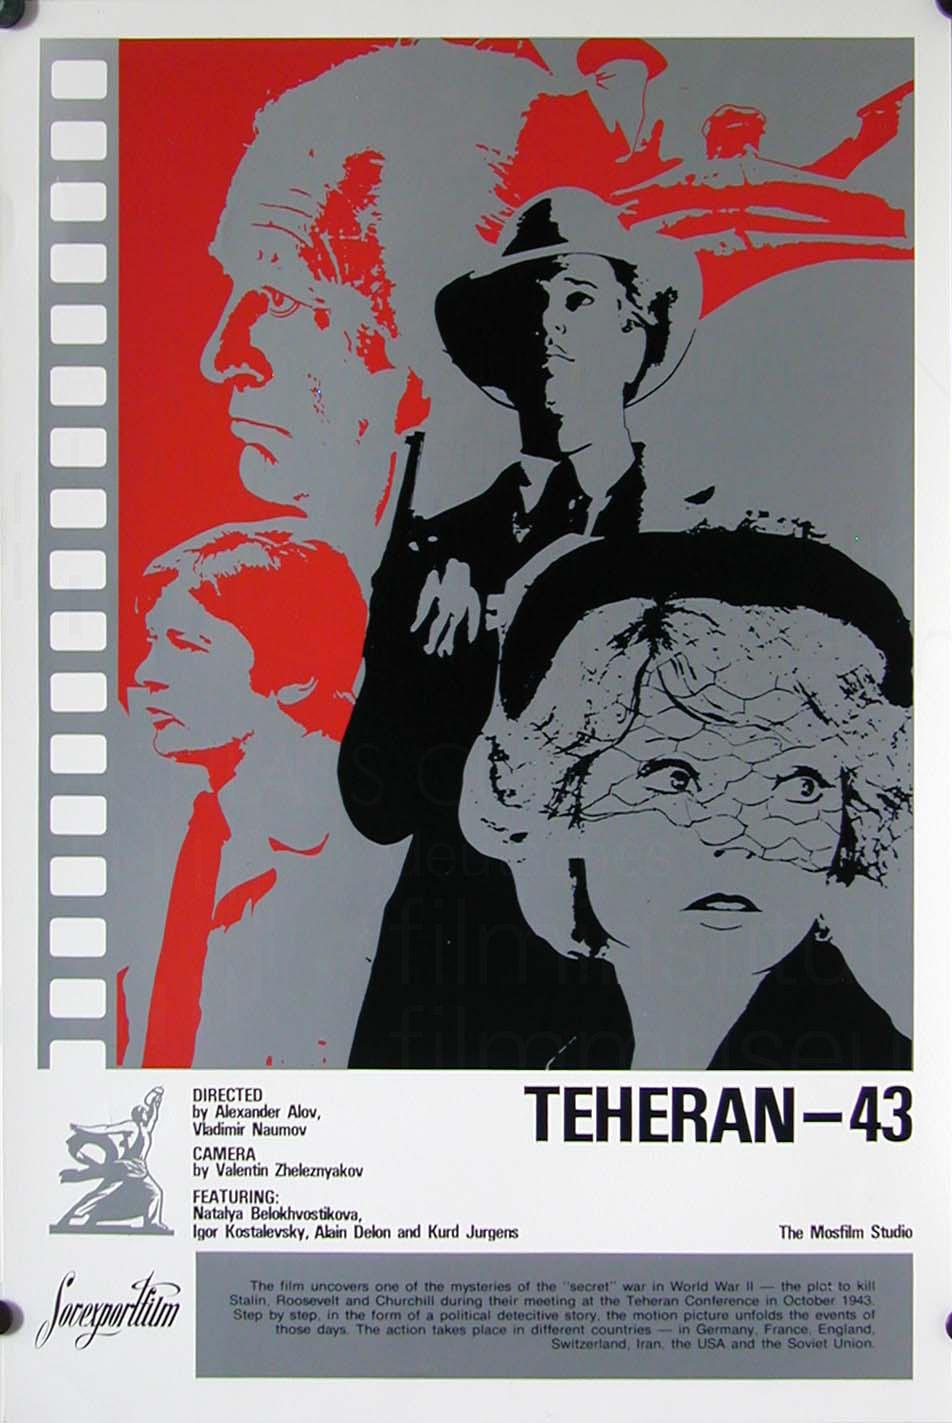 TEHERAN 43 (1981)